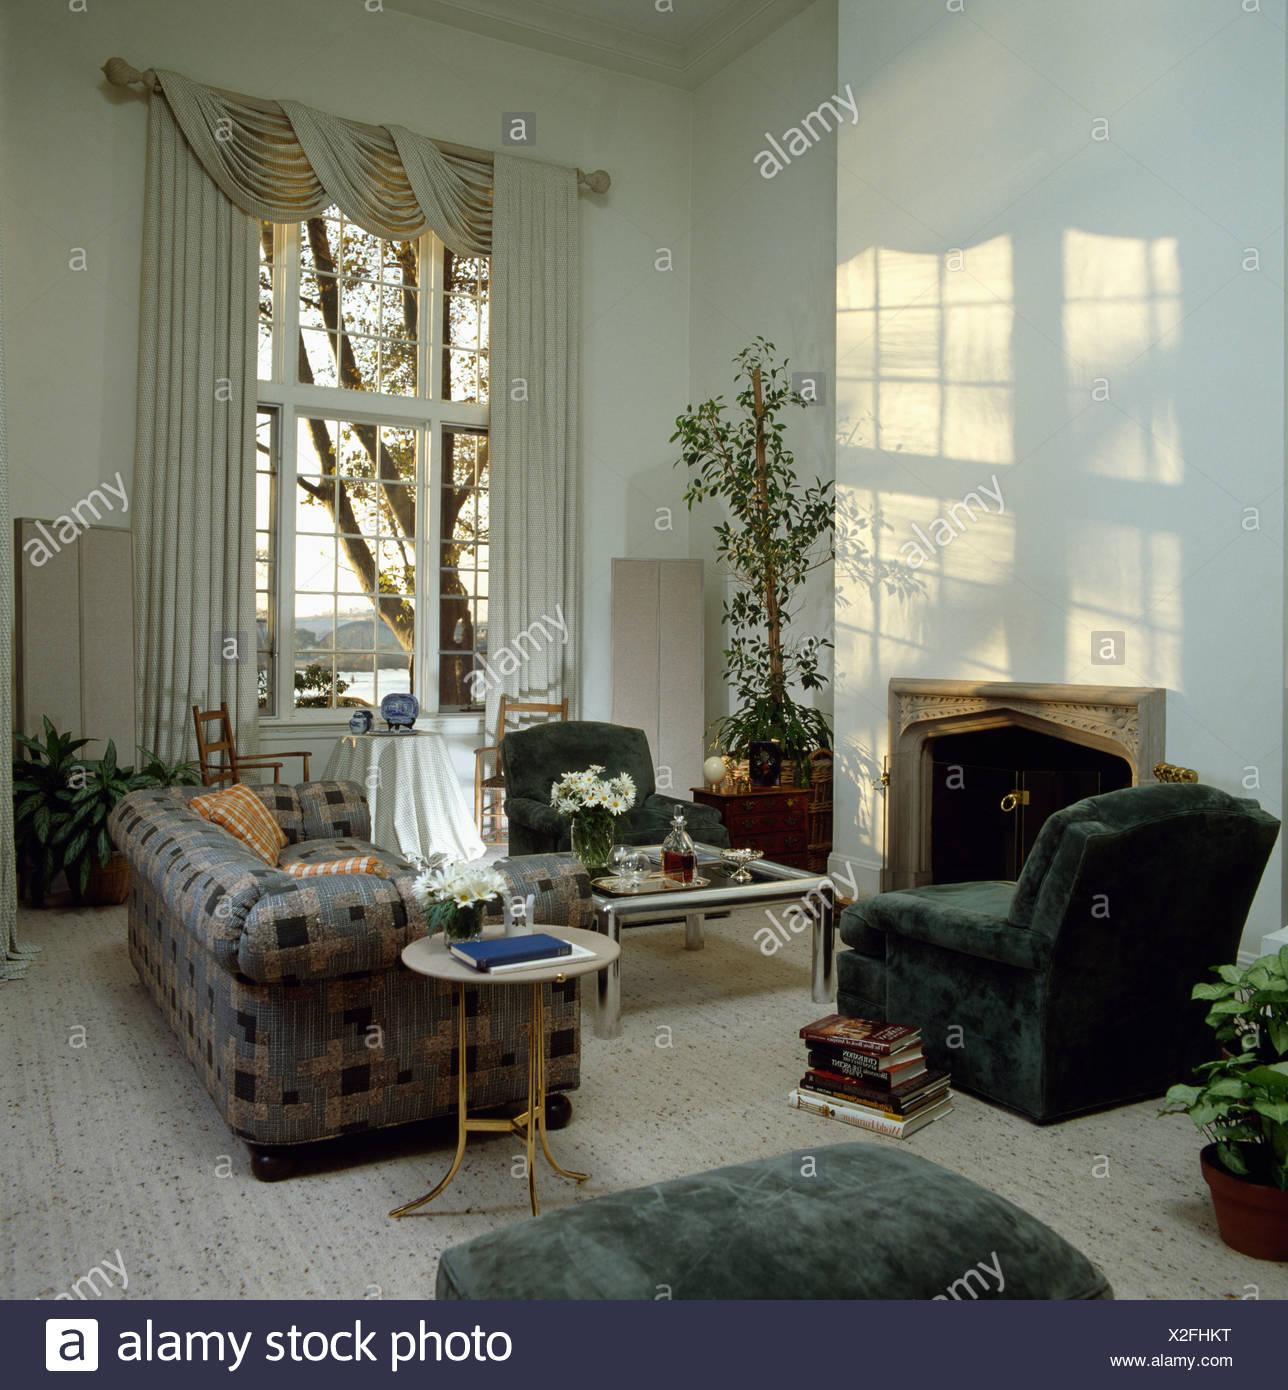 Chesterfield Sofa And Green Velour Armchair In Eighties Livingroom